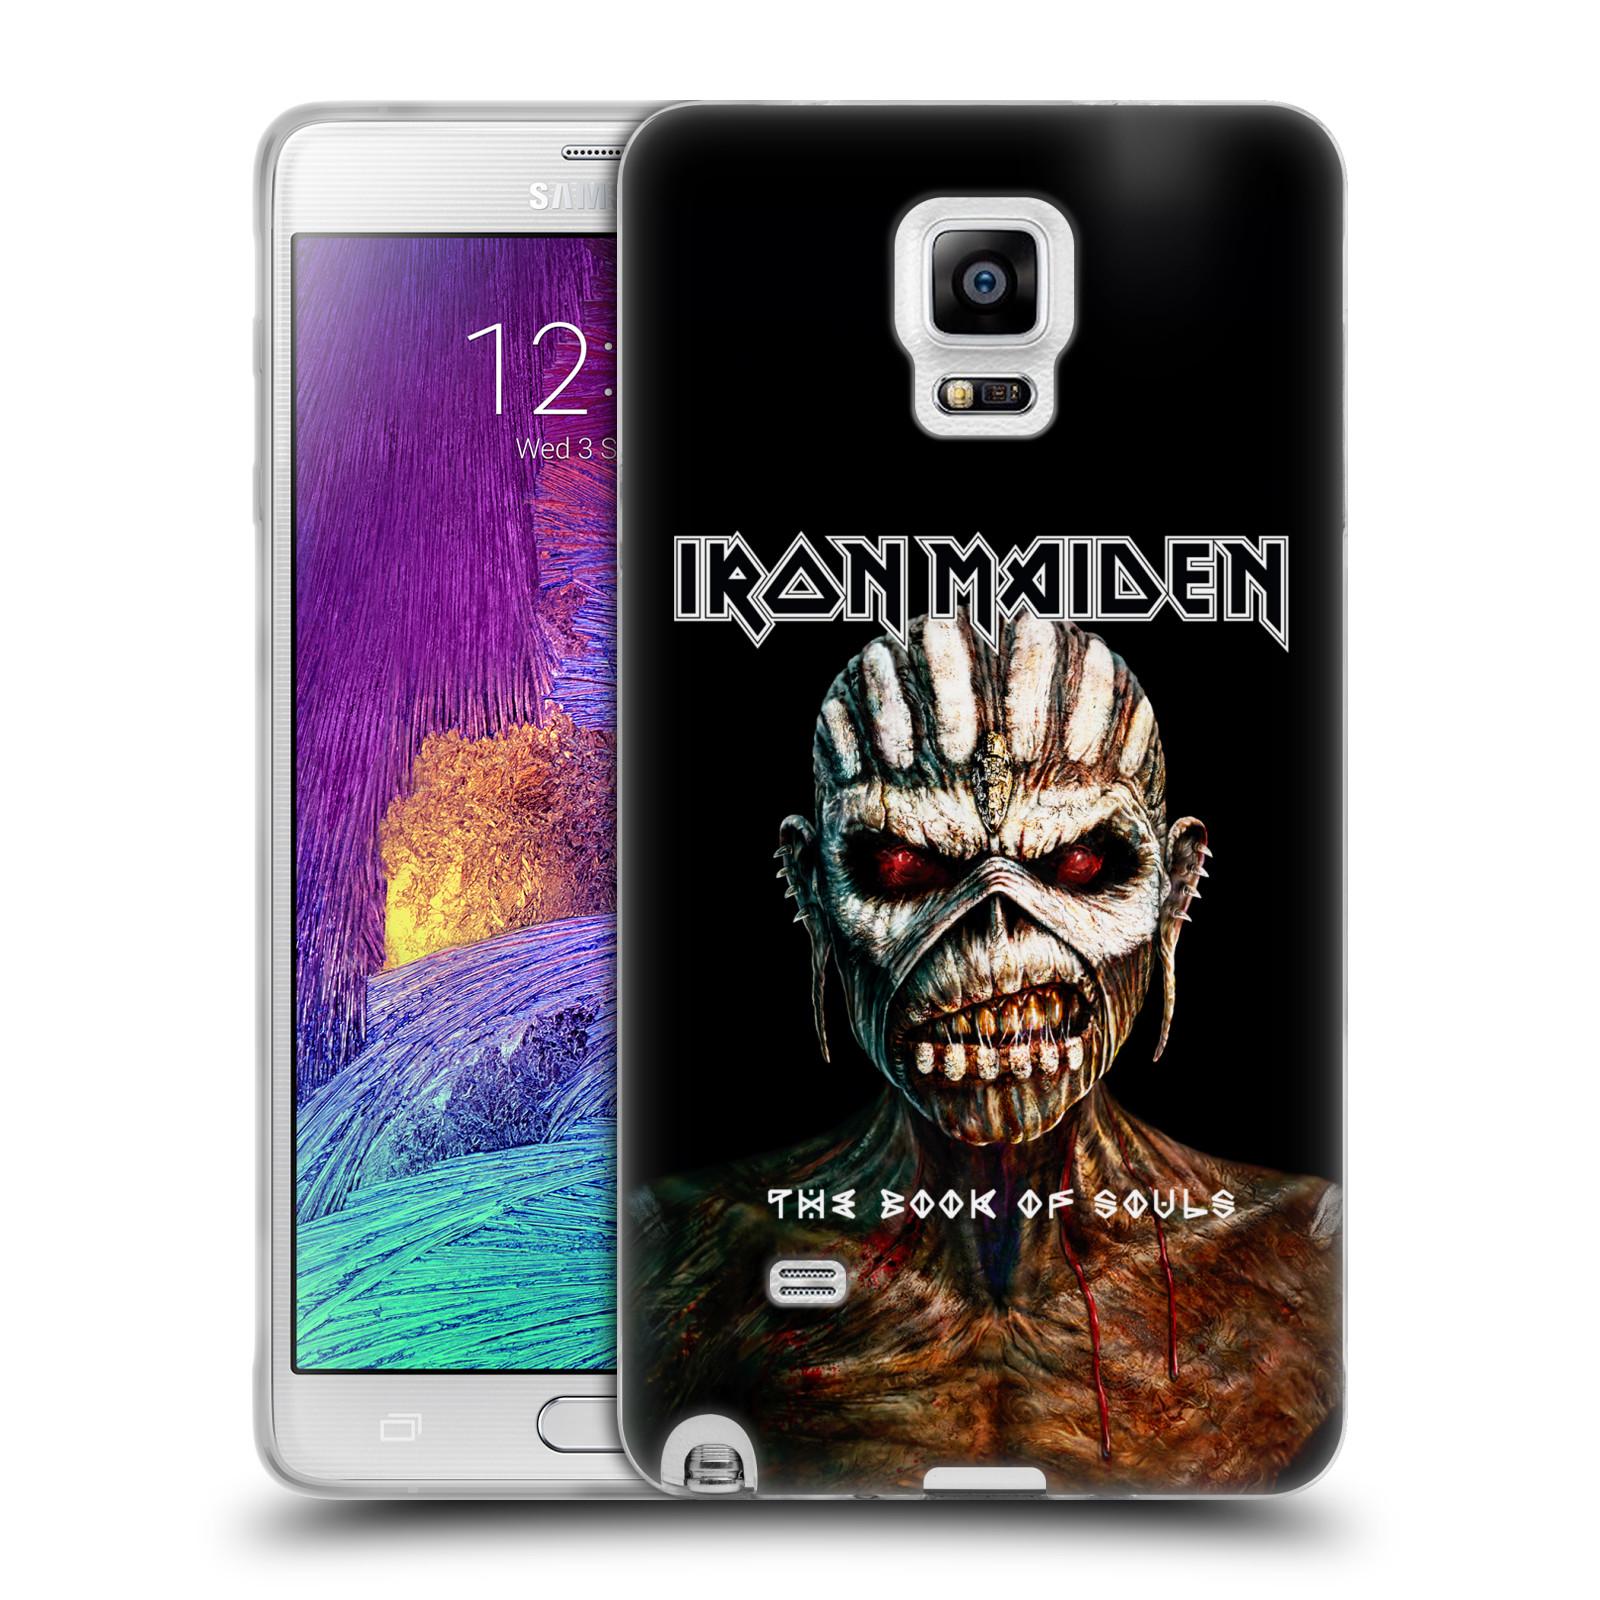 Silikonové pouzdro na mobil Samsung Galaxy Note 4 HEAD CASE - Iron Maiden - The Book Of Souls